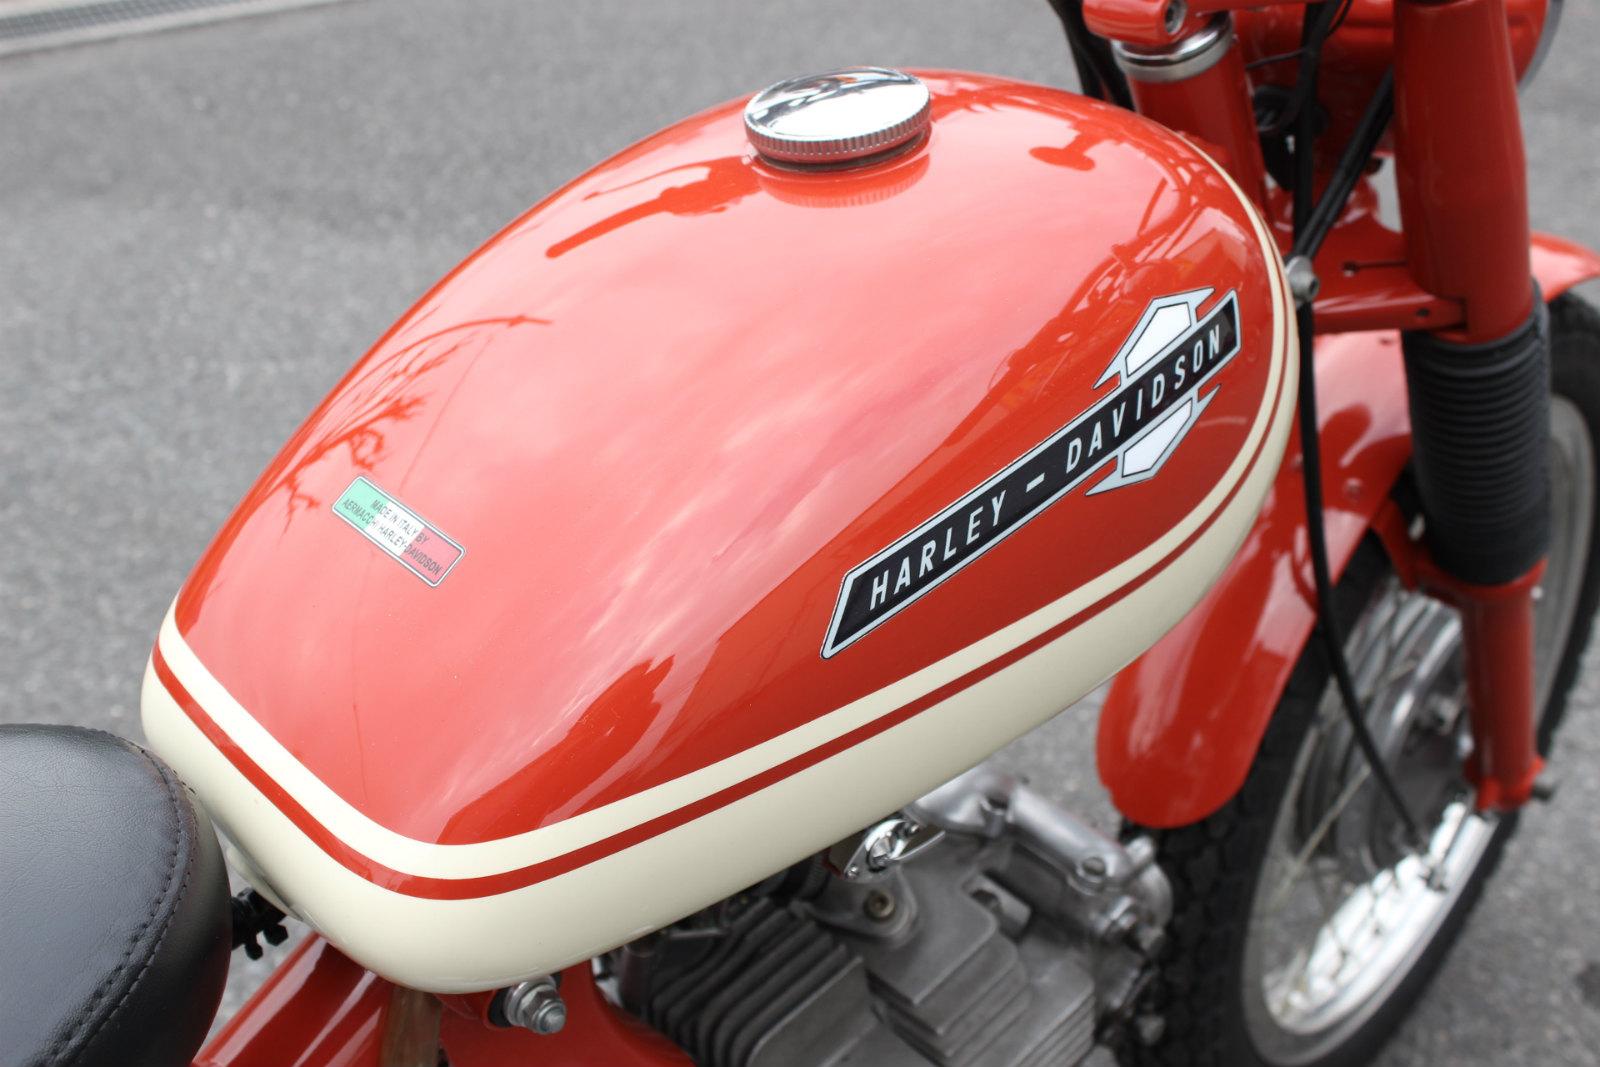 Harley Davidson Sprint_a0208987_14125730.jpg